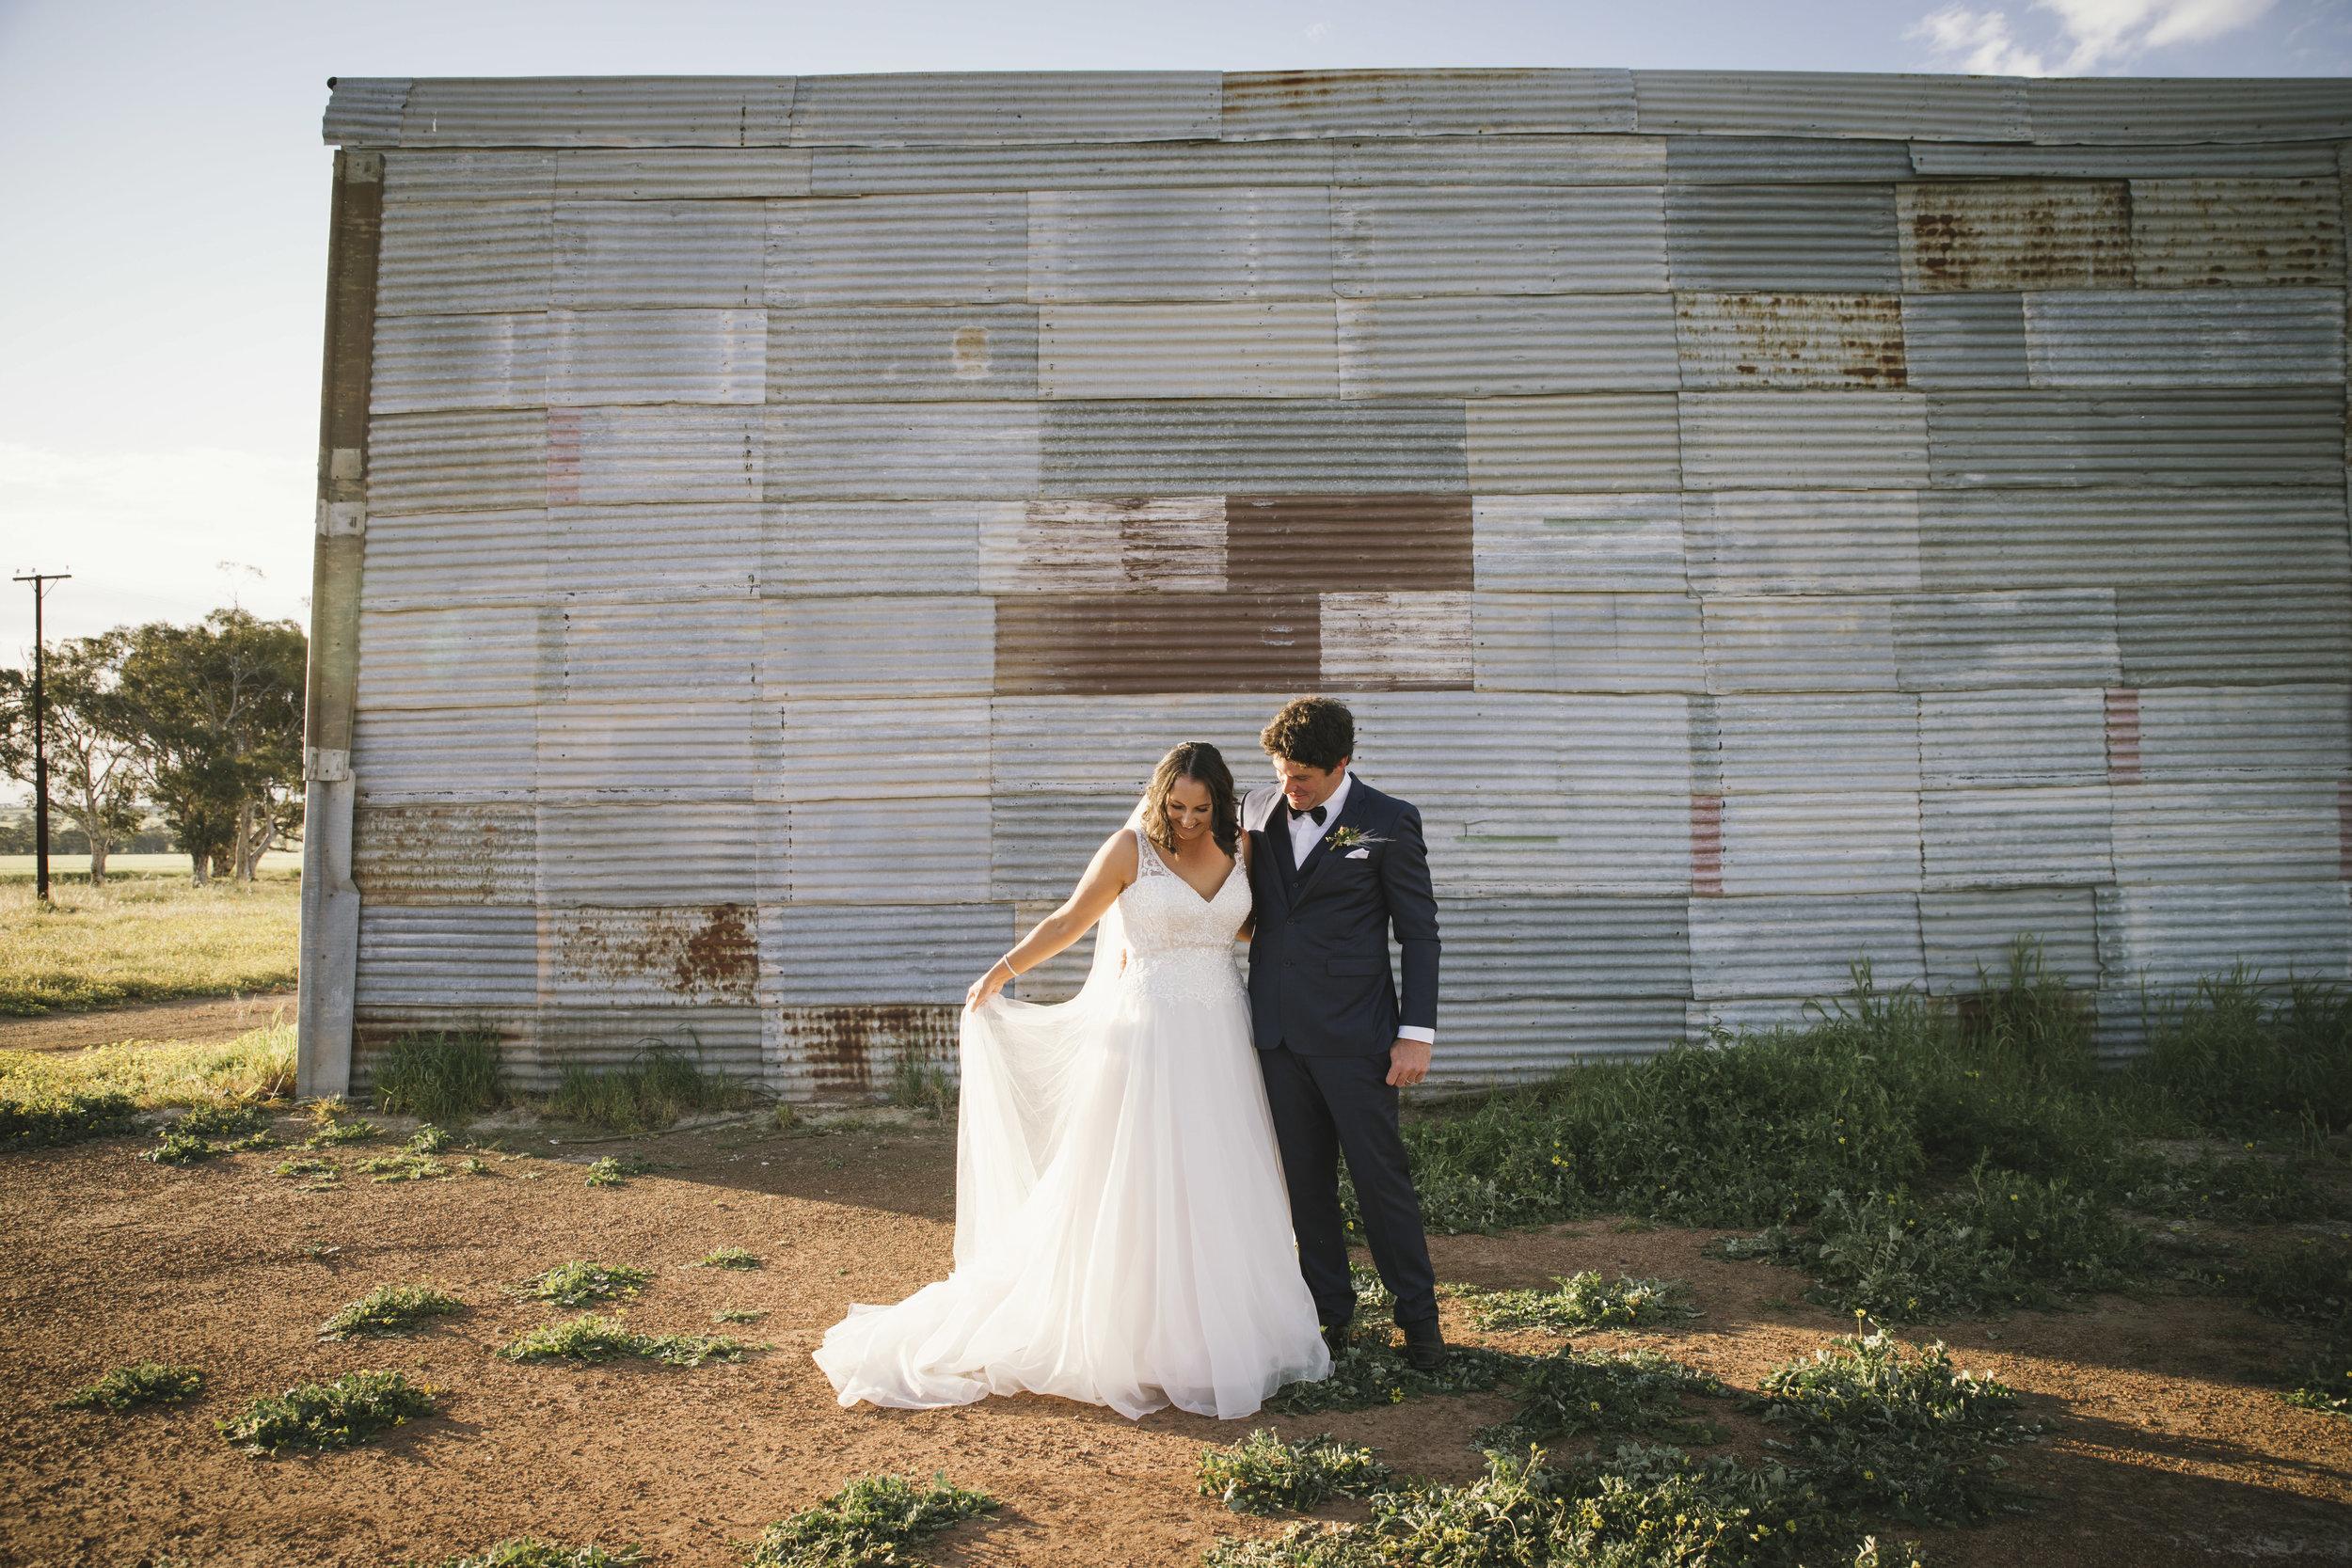 Angie Roe Photography Wheatbelt Avon Valley Farm Wedding (45).jpg